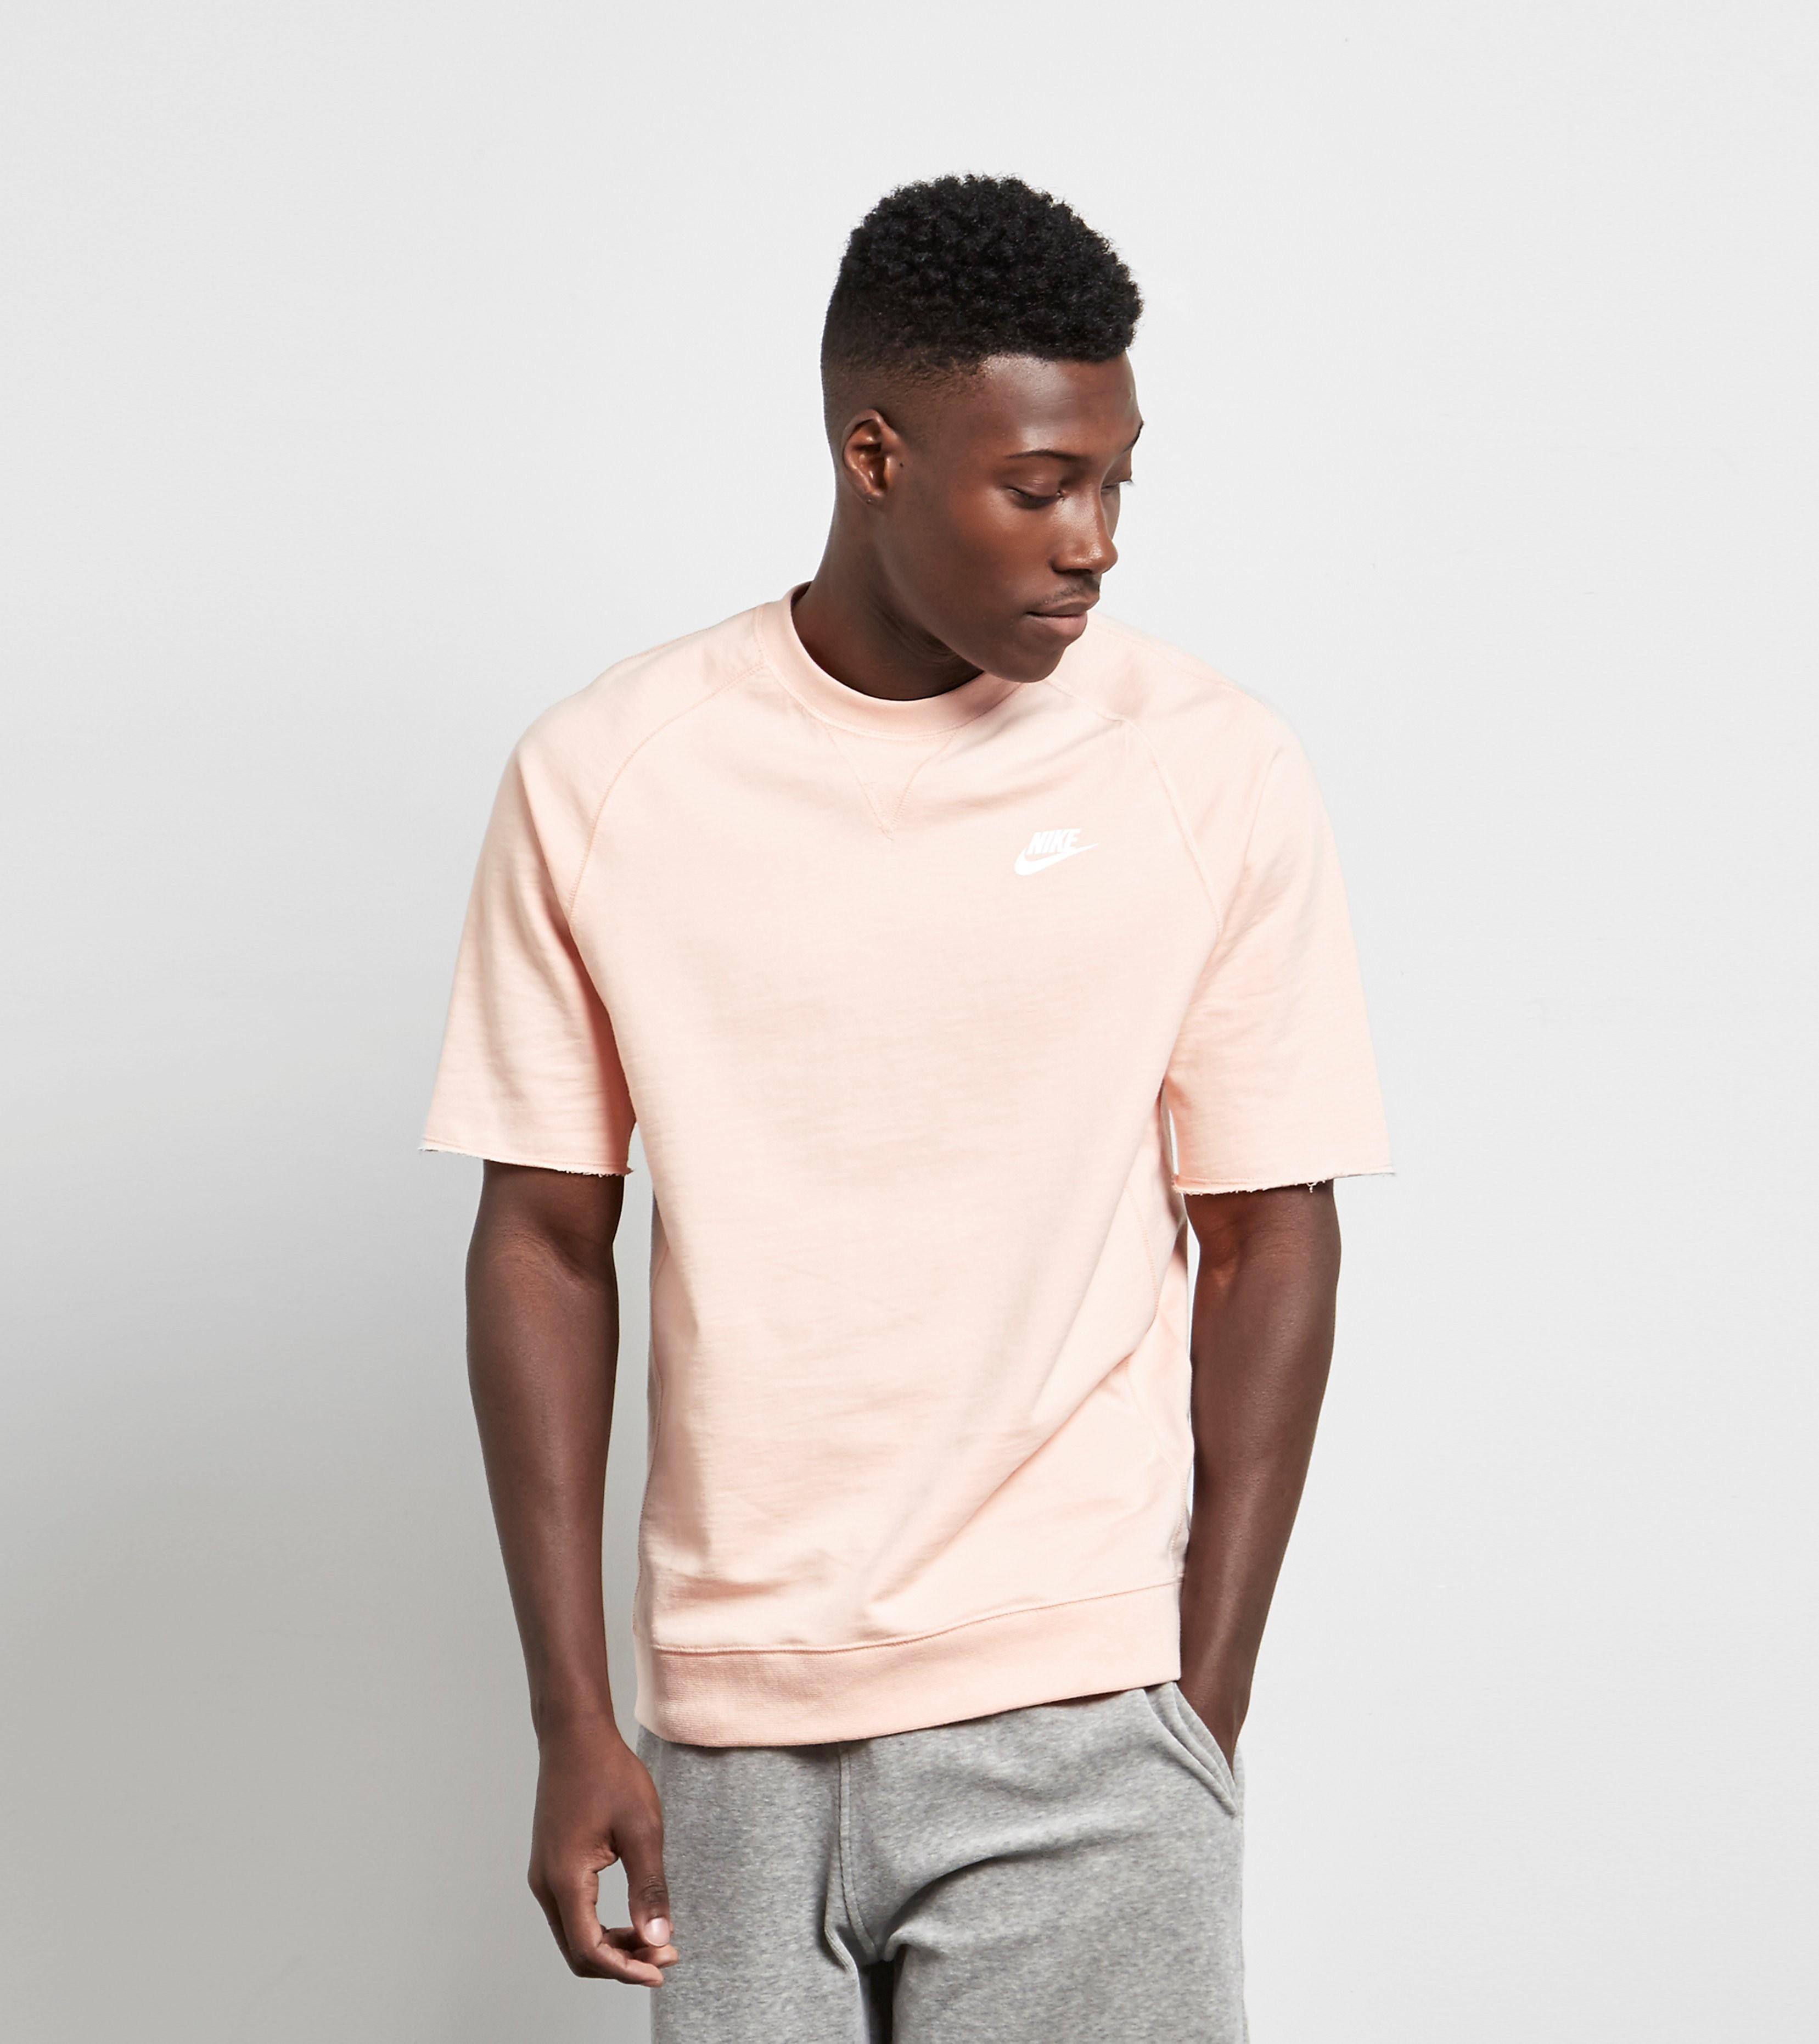 Nike Pastel Short-Sleeve Crew